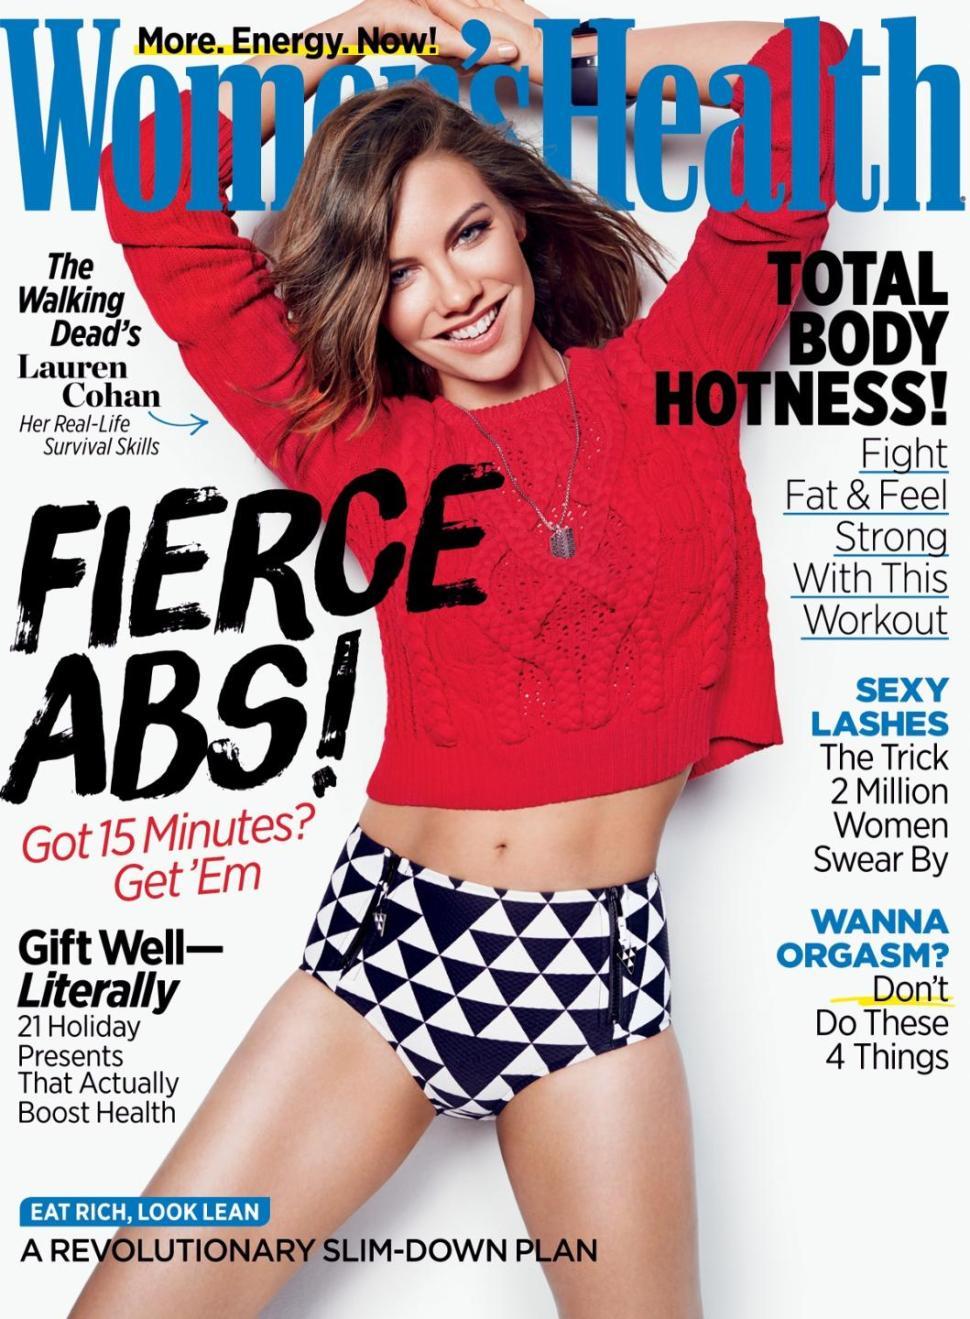 cohan12f 3 web - Lauren Cohan Dazzles in New Women's Health Cover Story